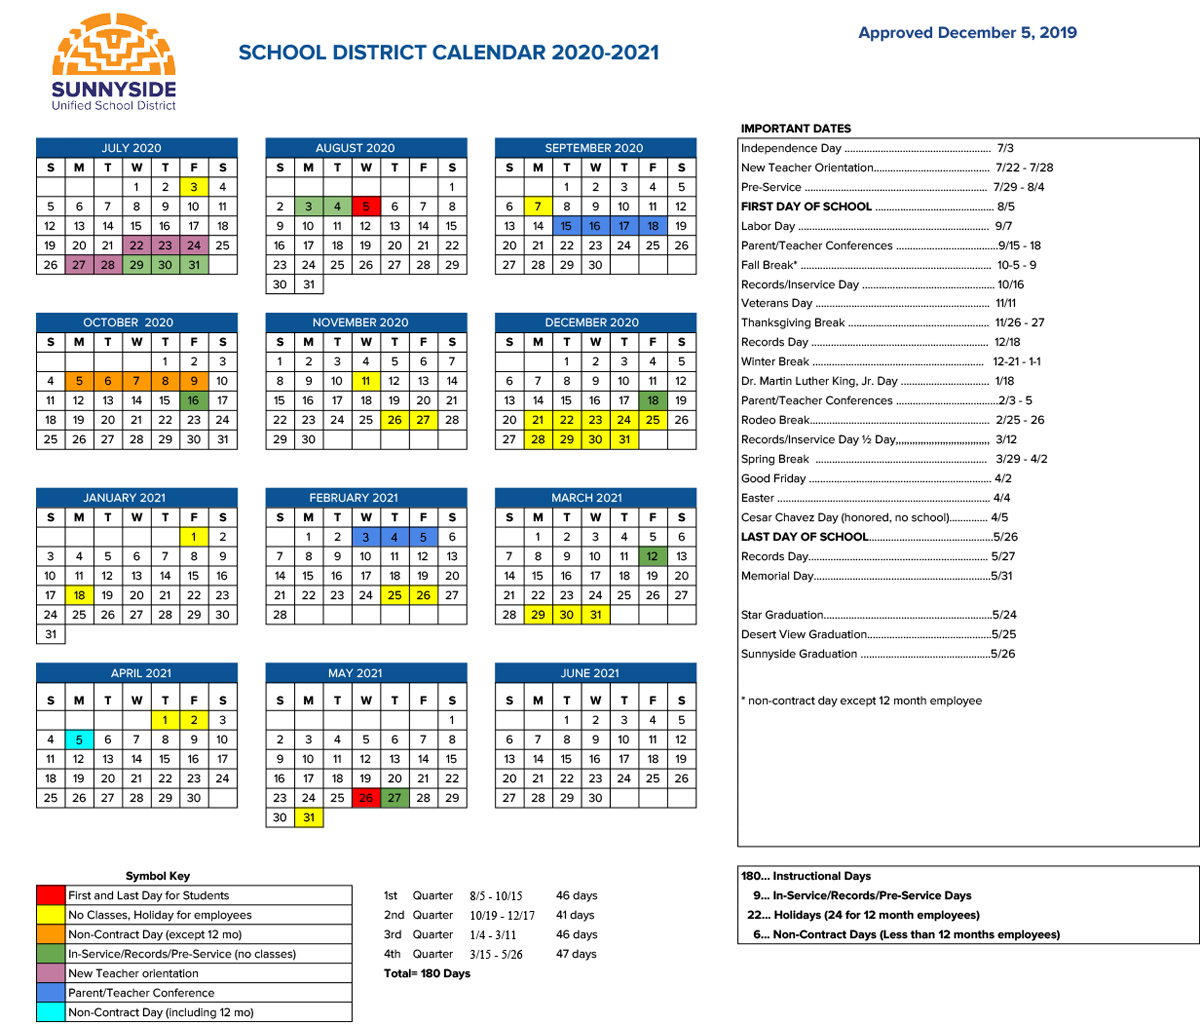 Academic Calendar | Sunnyside Unified School District with regard to Uc Berkeley Payroll Calendar 2020